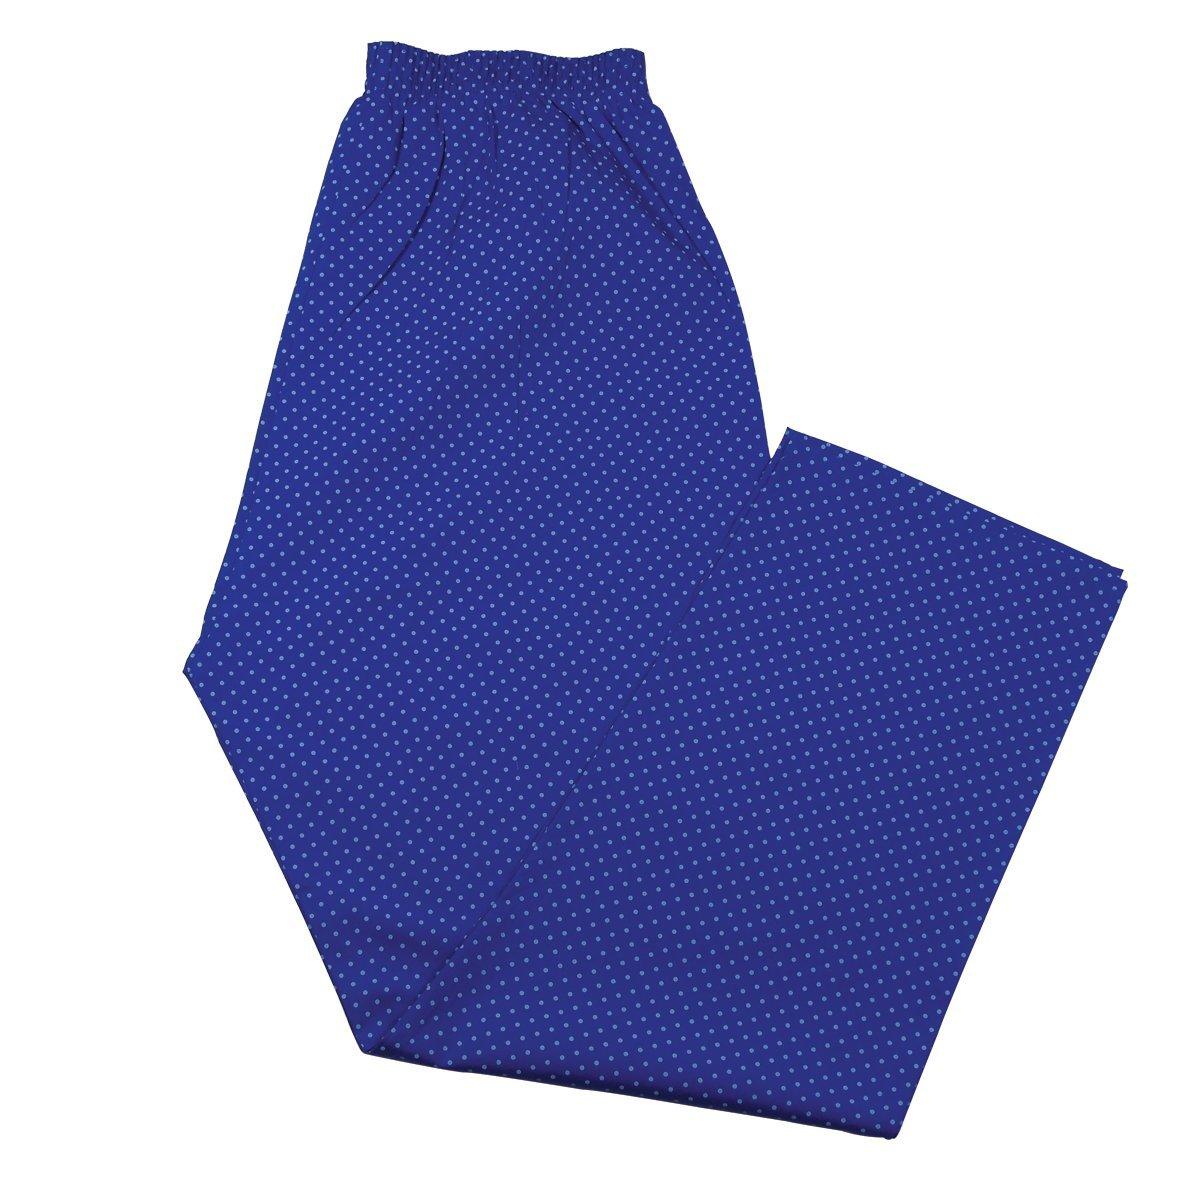 Men's Chelsea Blue Spot Pajamas Set, Fine Brushed Cotton Top & Trousers, Royal Blue Medium by Bown of London (Image #2)